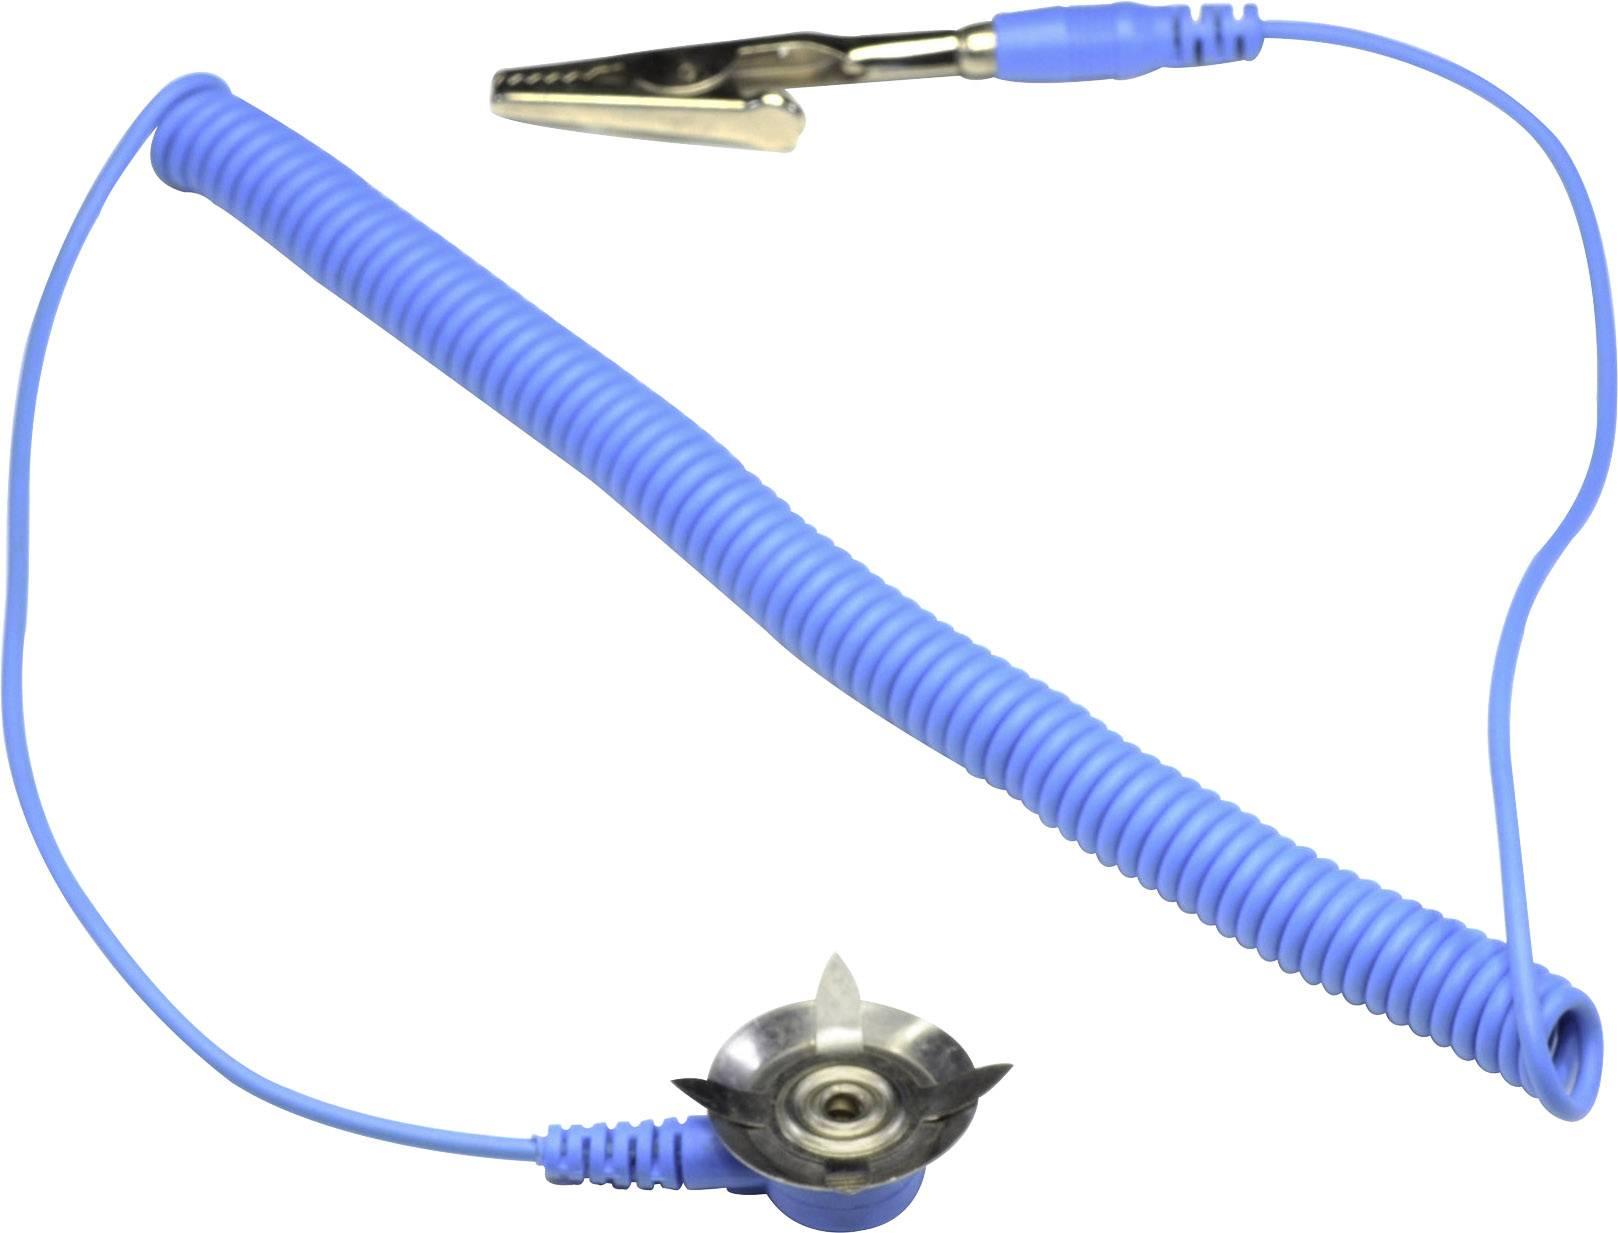 ESD zemnicí kabel k rohoži Conrad Components EkA-305-AD-S/K, 3.05 m EkA-305-AD-S/K krokosvorka